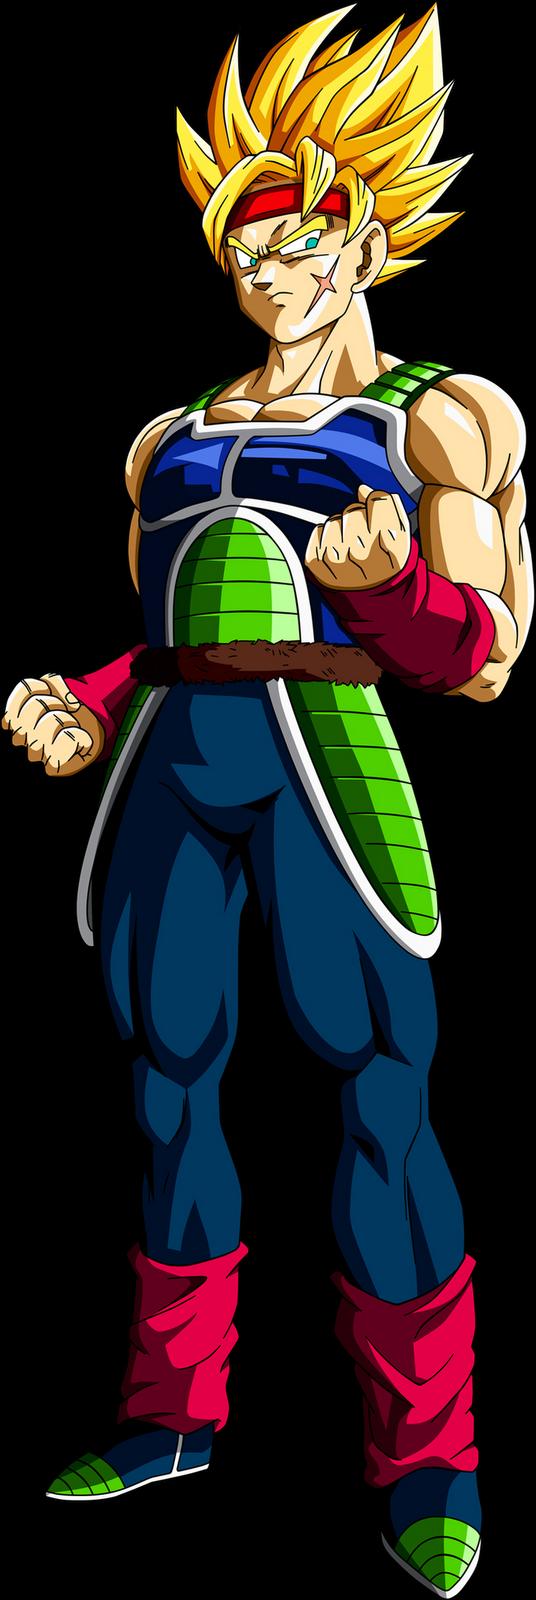 Bardock   Dragon Ball Universe   Fandom powered by Wikia